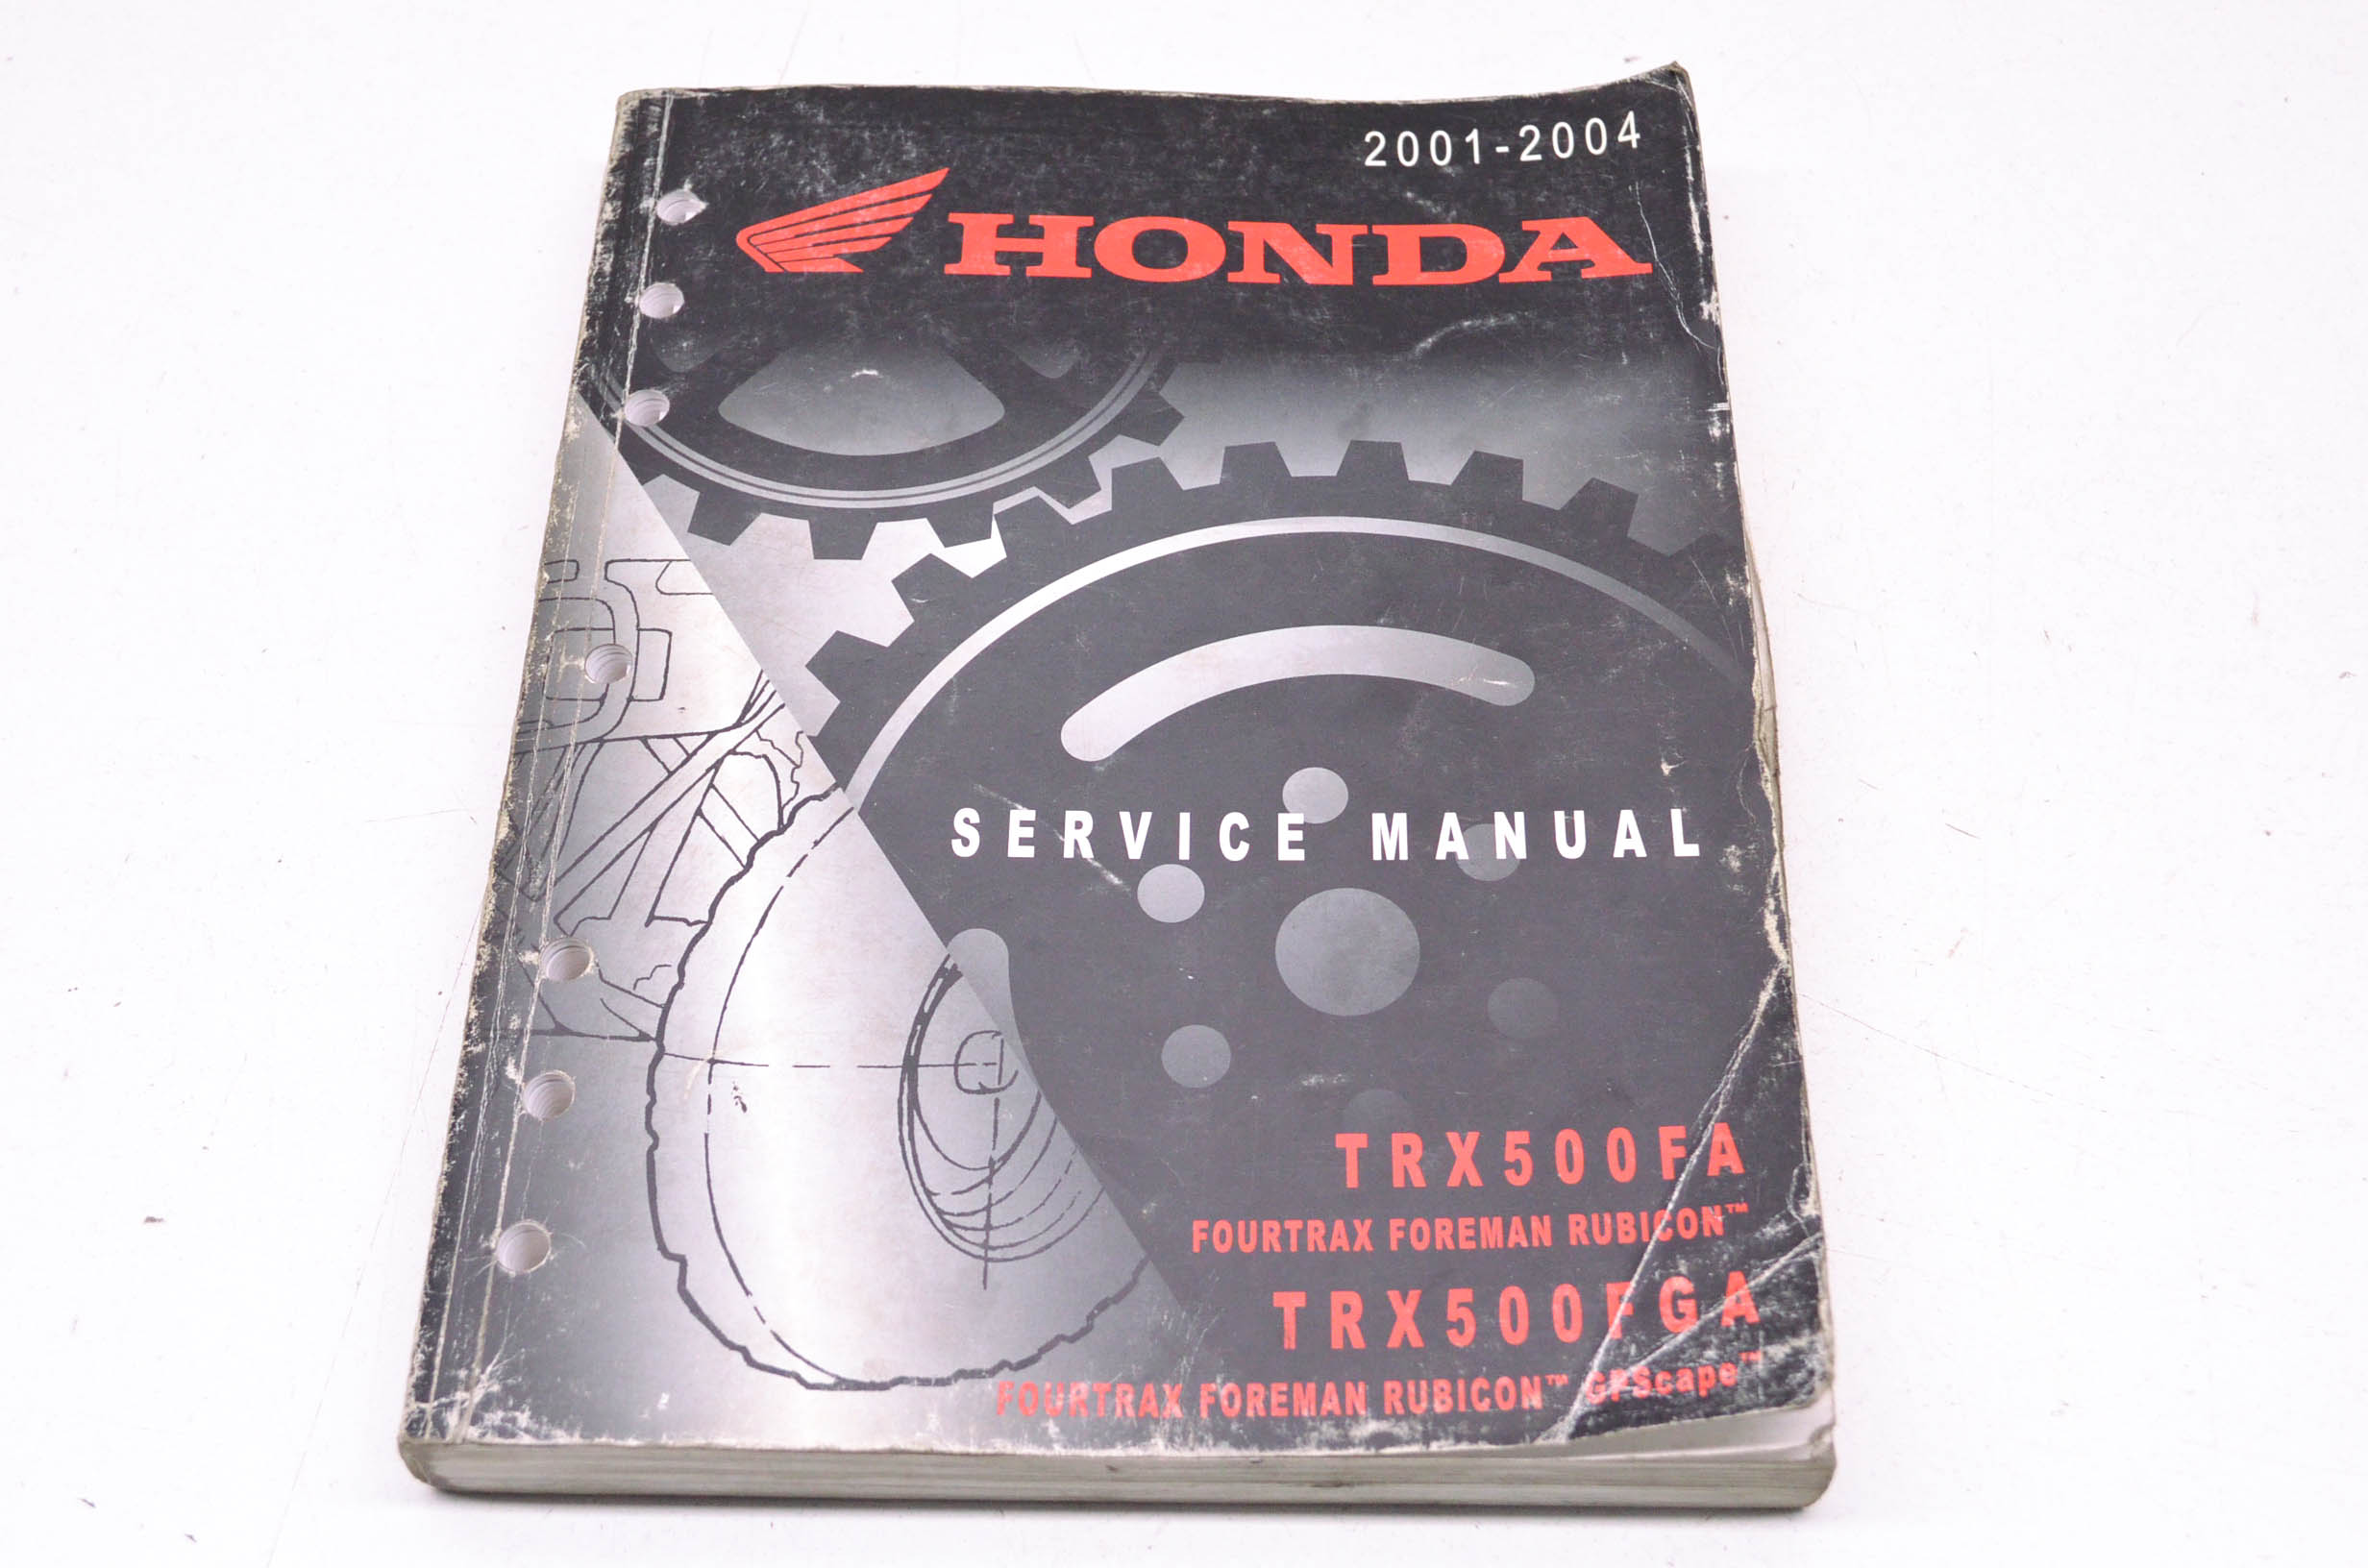 Honda 61HN203 01-04 TRX500FA, FourTrax, Foreman, Rubicon/GPScape, TRX500FGA  Service Manual QTY 1 - Walmart.com